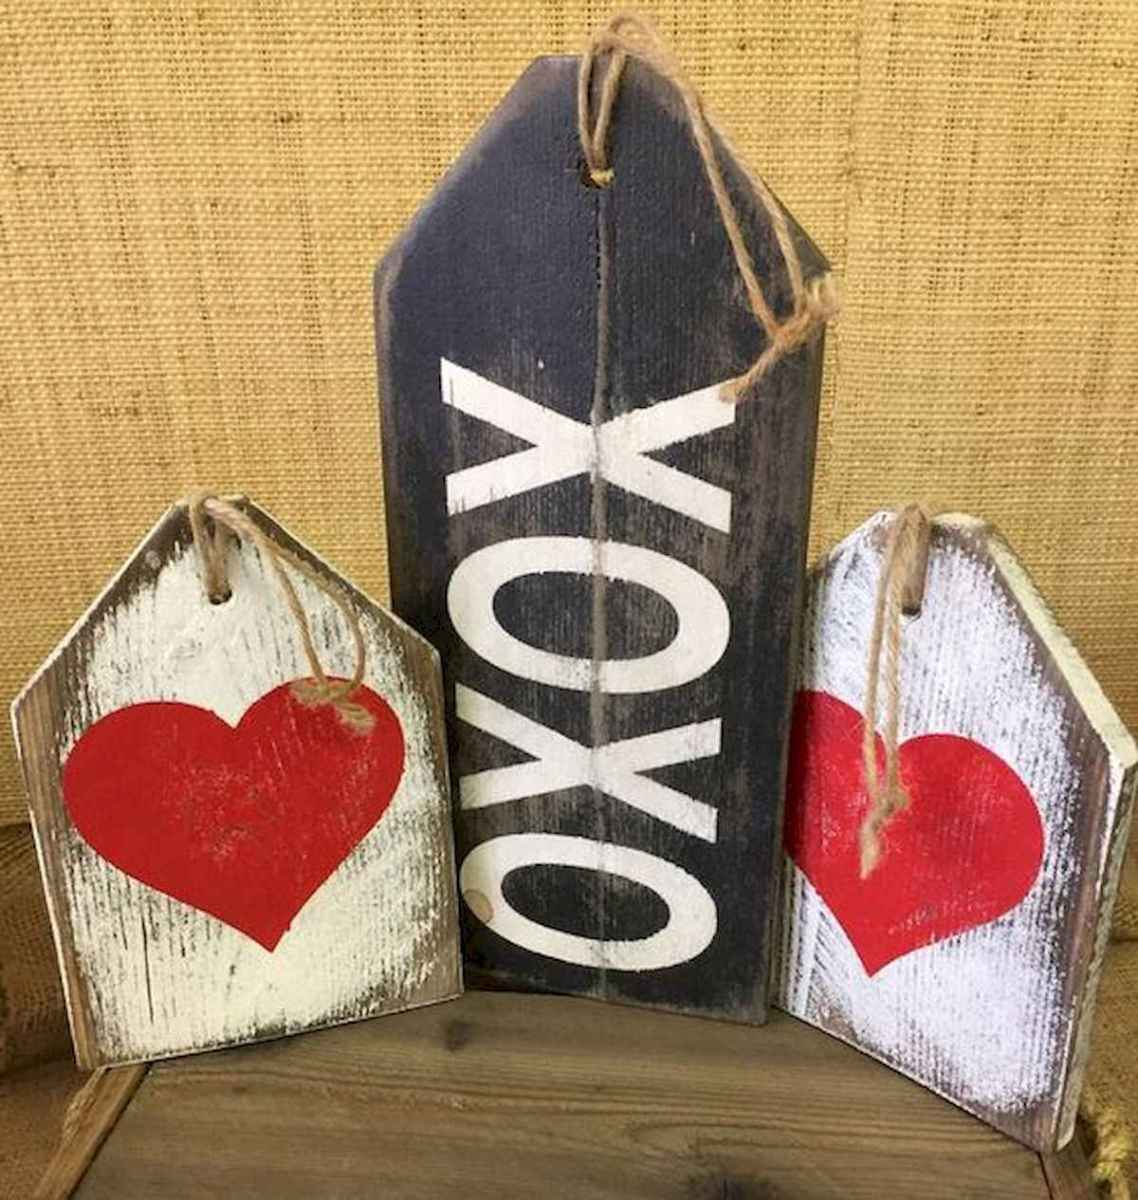 75 Romantic Valentines Day Crafts Design Ideas (1)